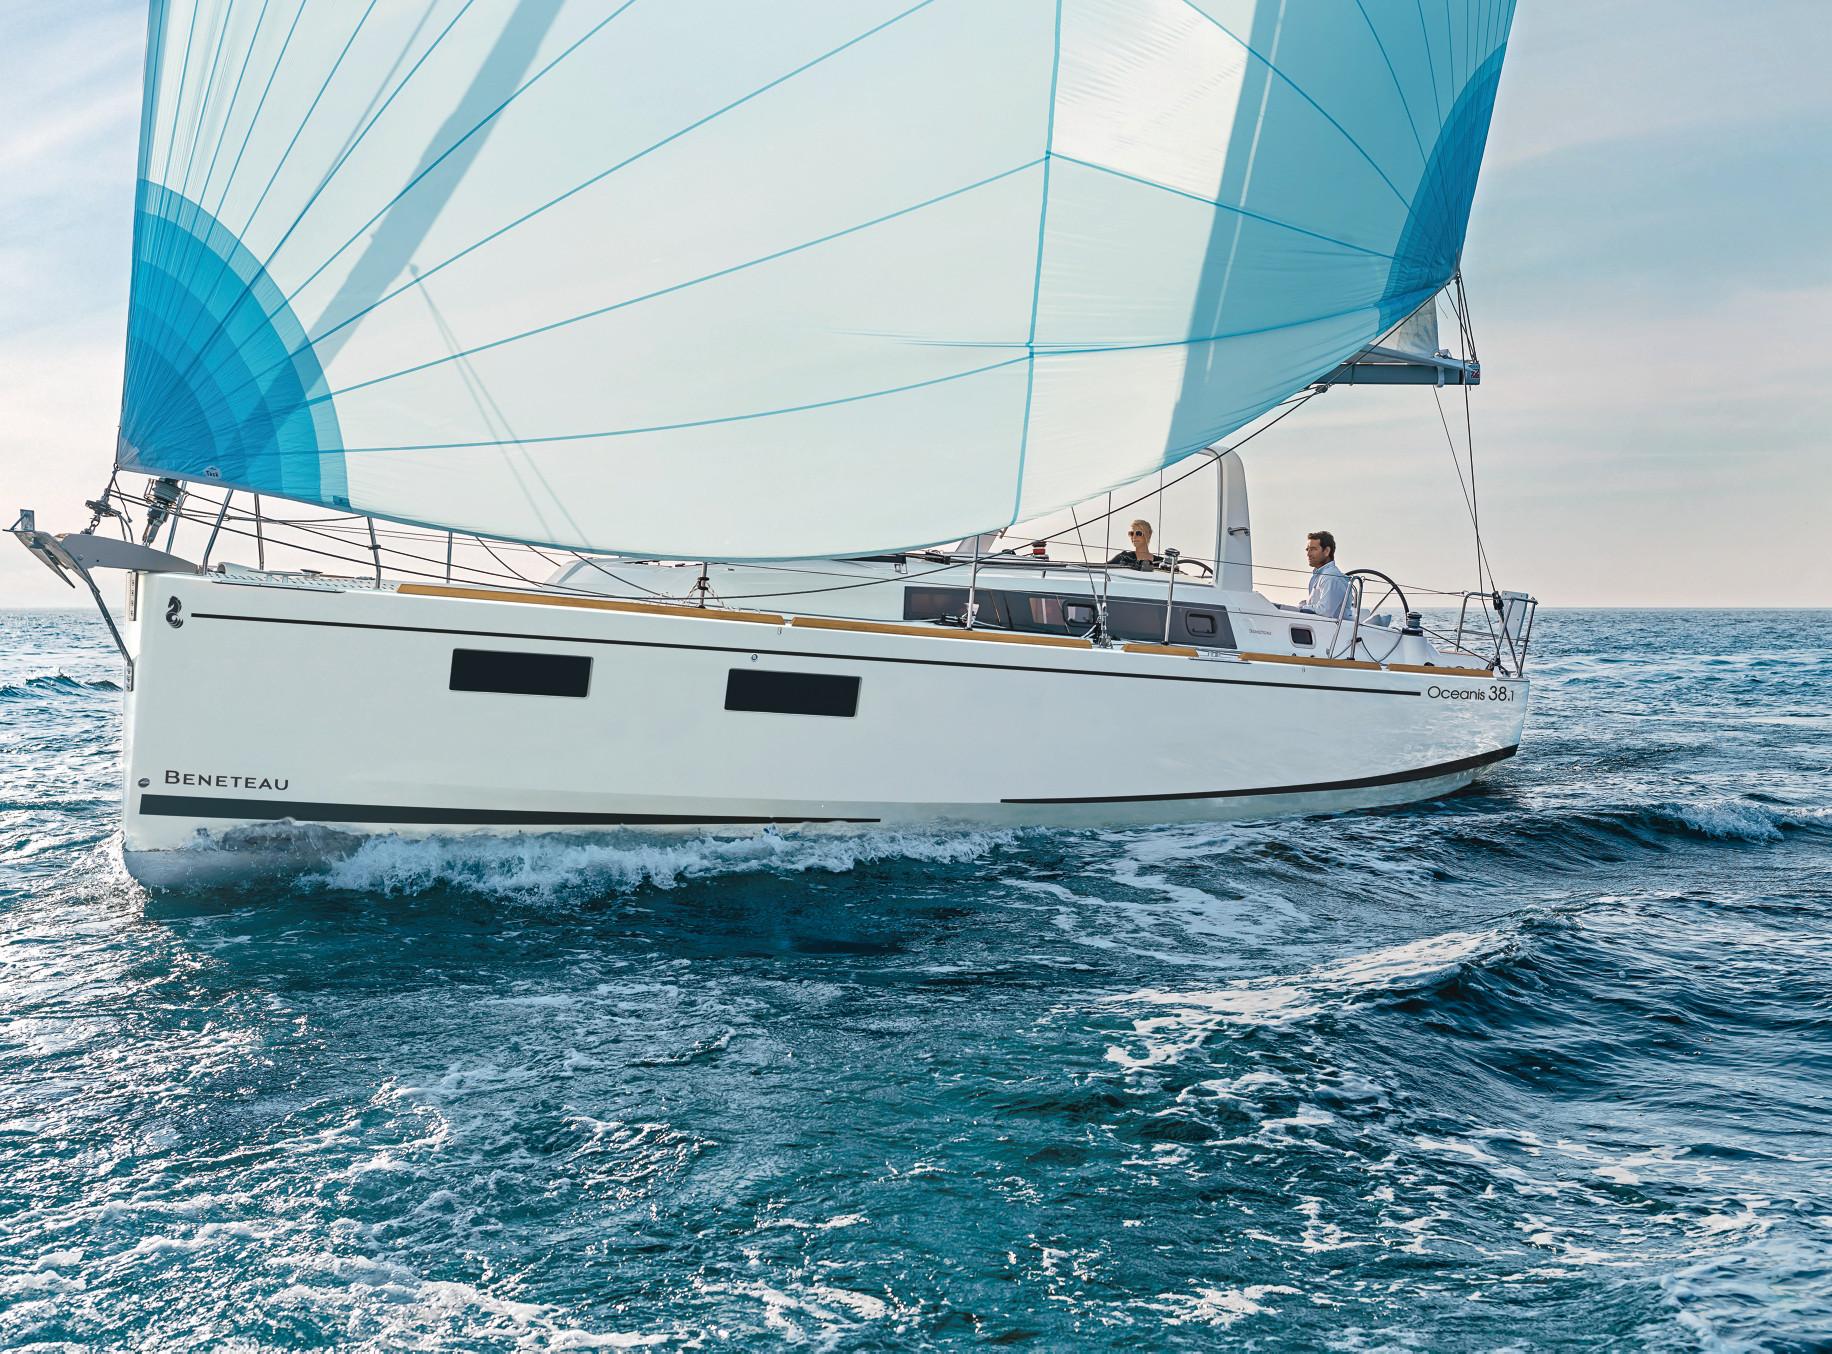 SALE SPECIAL! Beneteau Oceanis 38.1 $239,900 – NOW SOLD!